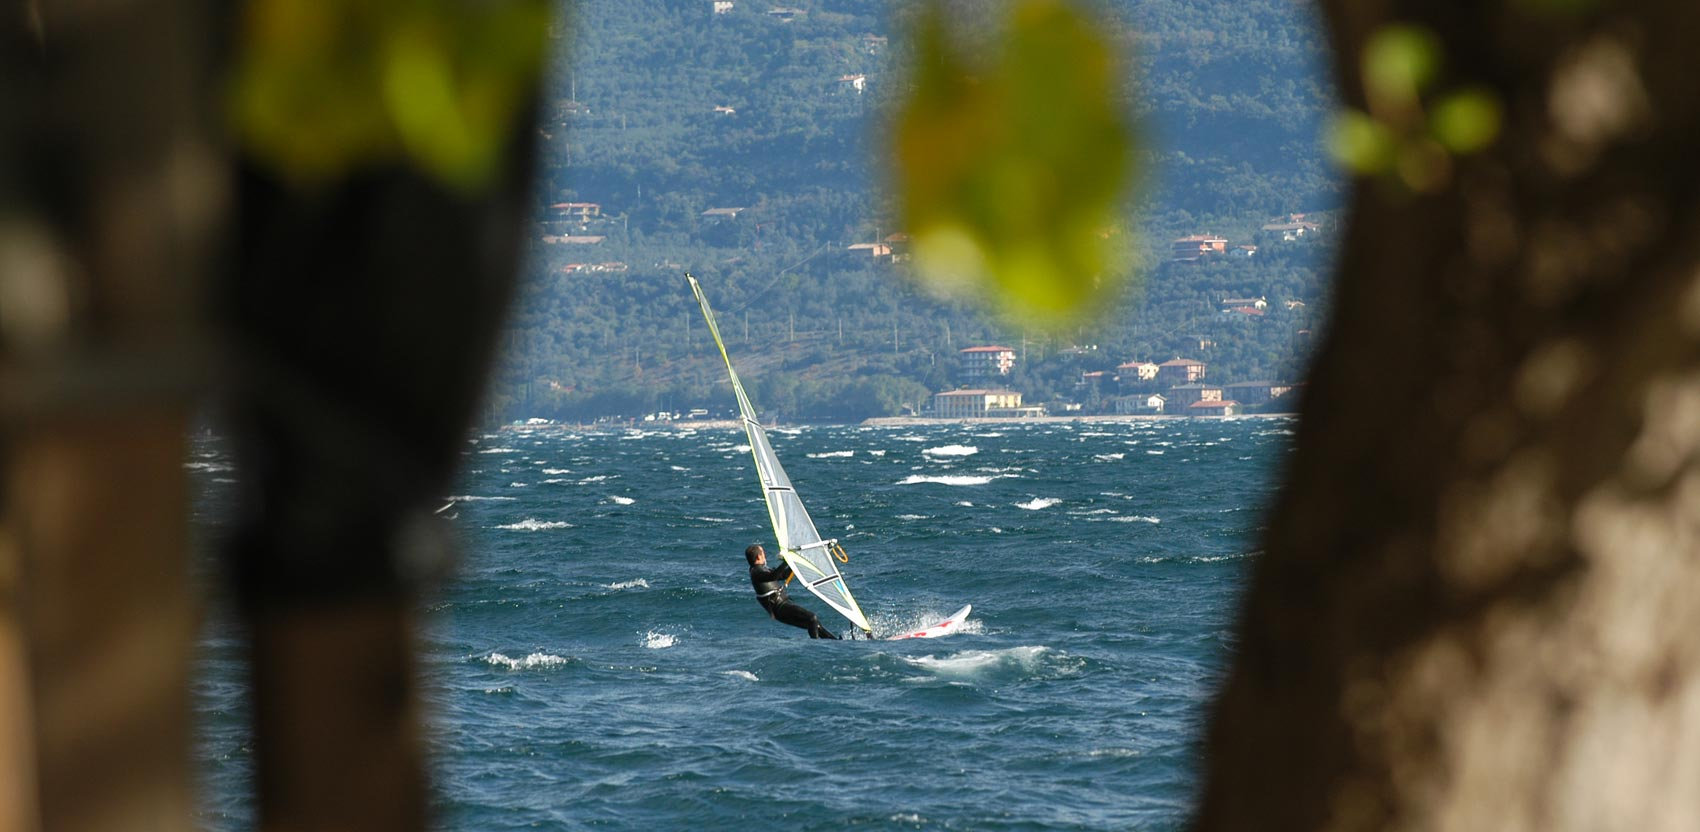 Vela e Windsurf a Malcesine sul lago di Garda